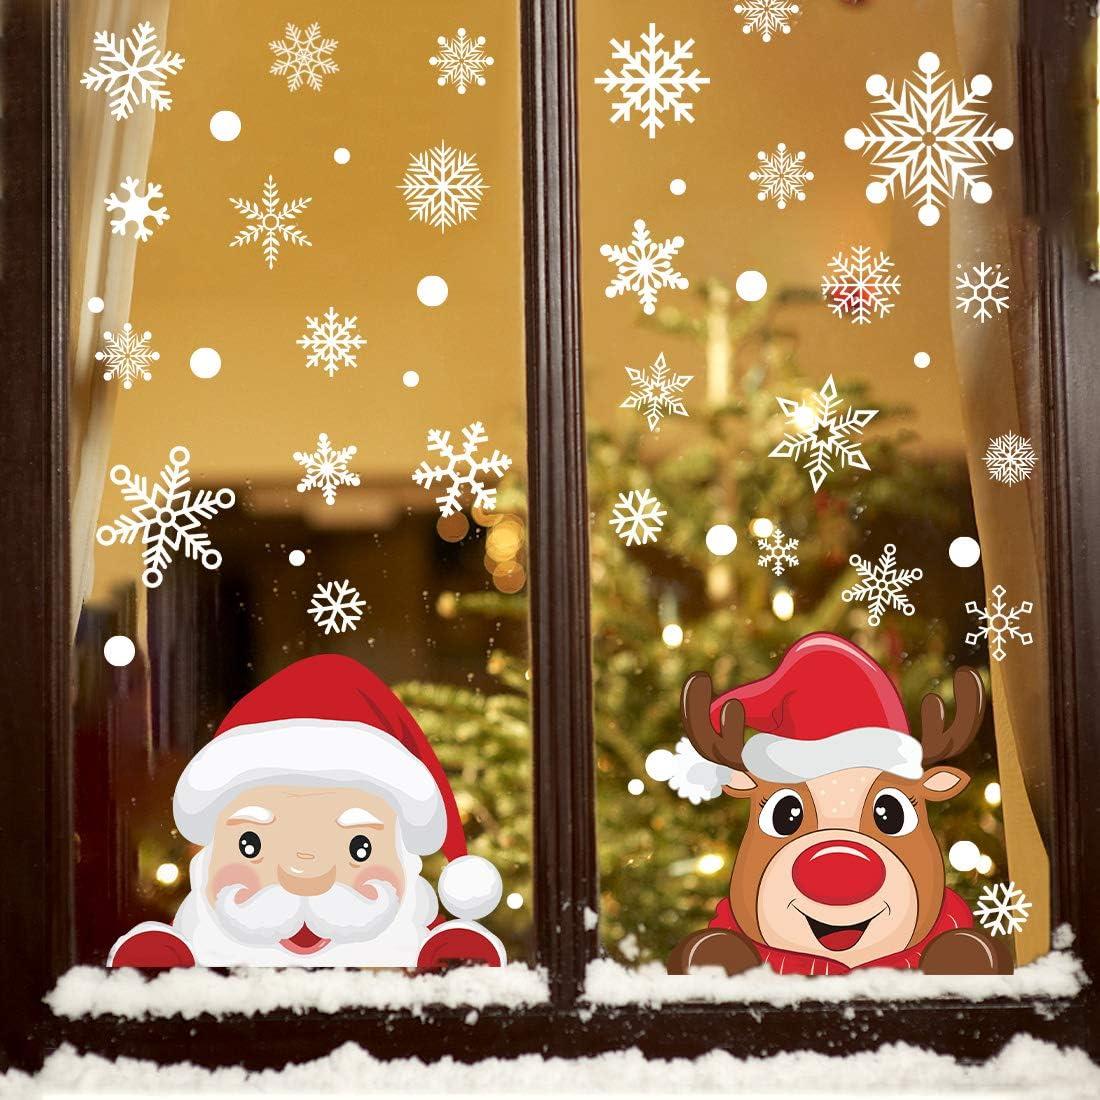 8 sheet Christmas Snowflake Window Glass Cling Stickers Santa Claus Decals Xmas